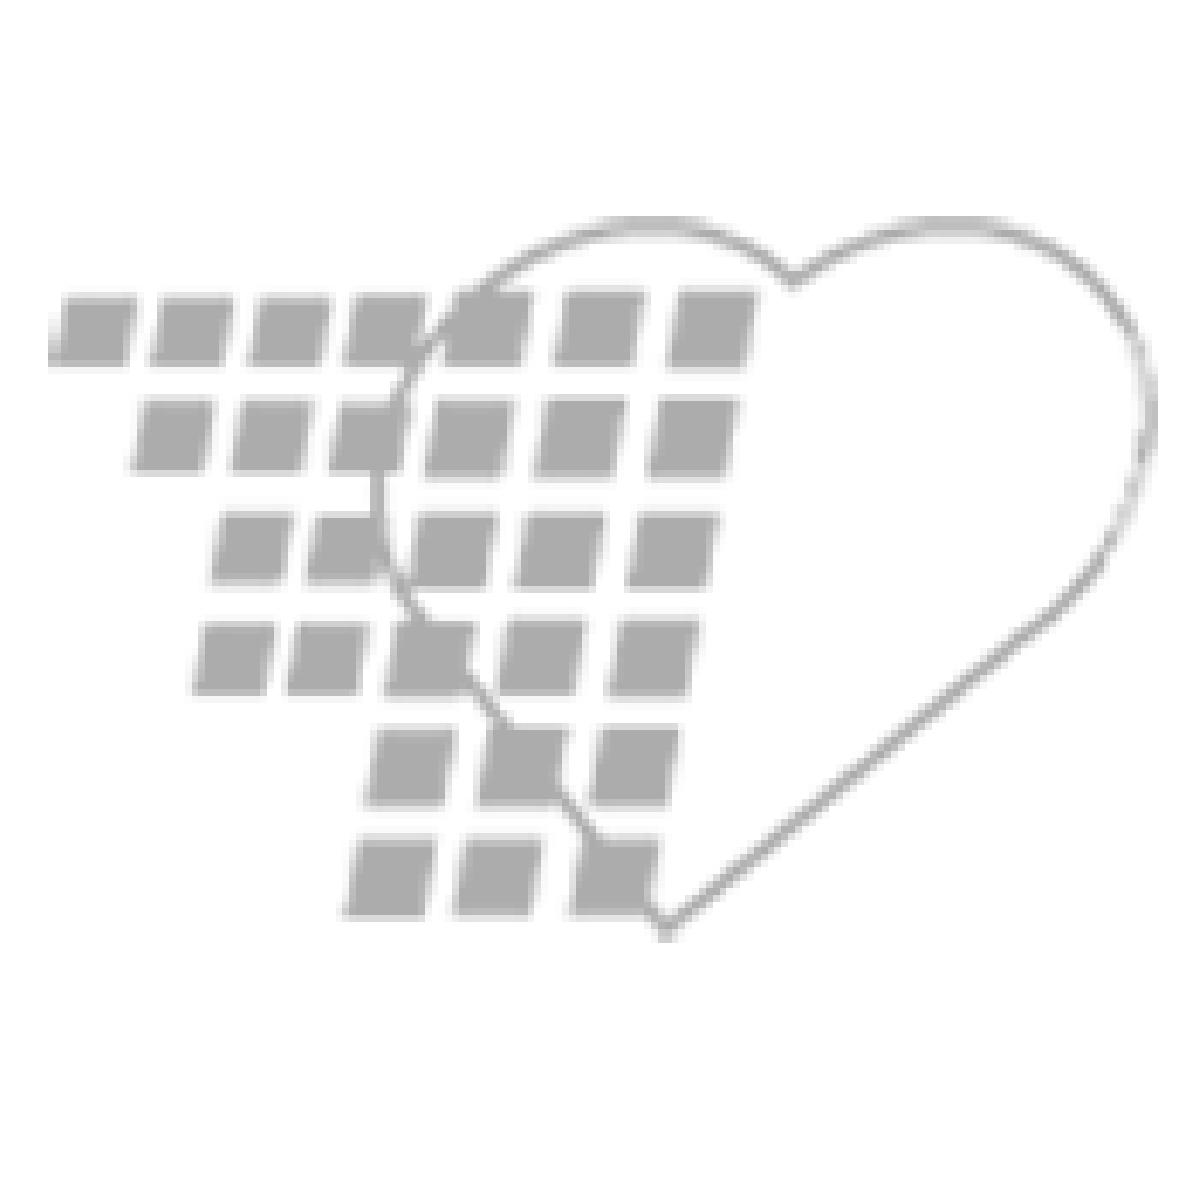 07-71-0318 Endotrach Cuff Murphy HVT 9.0